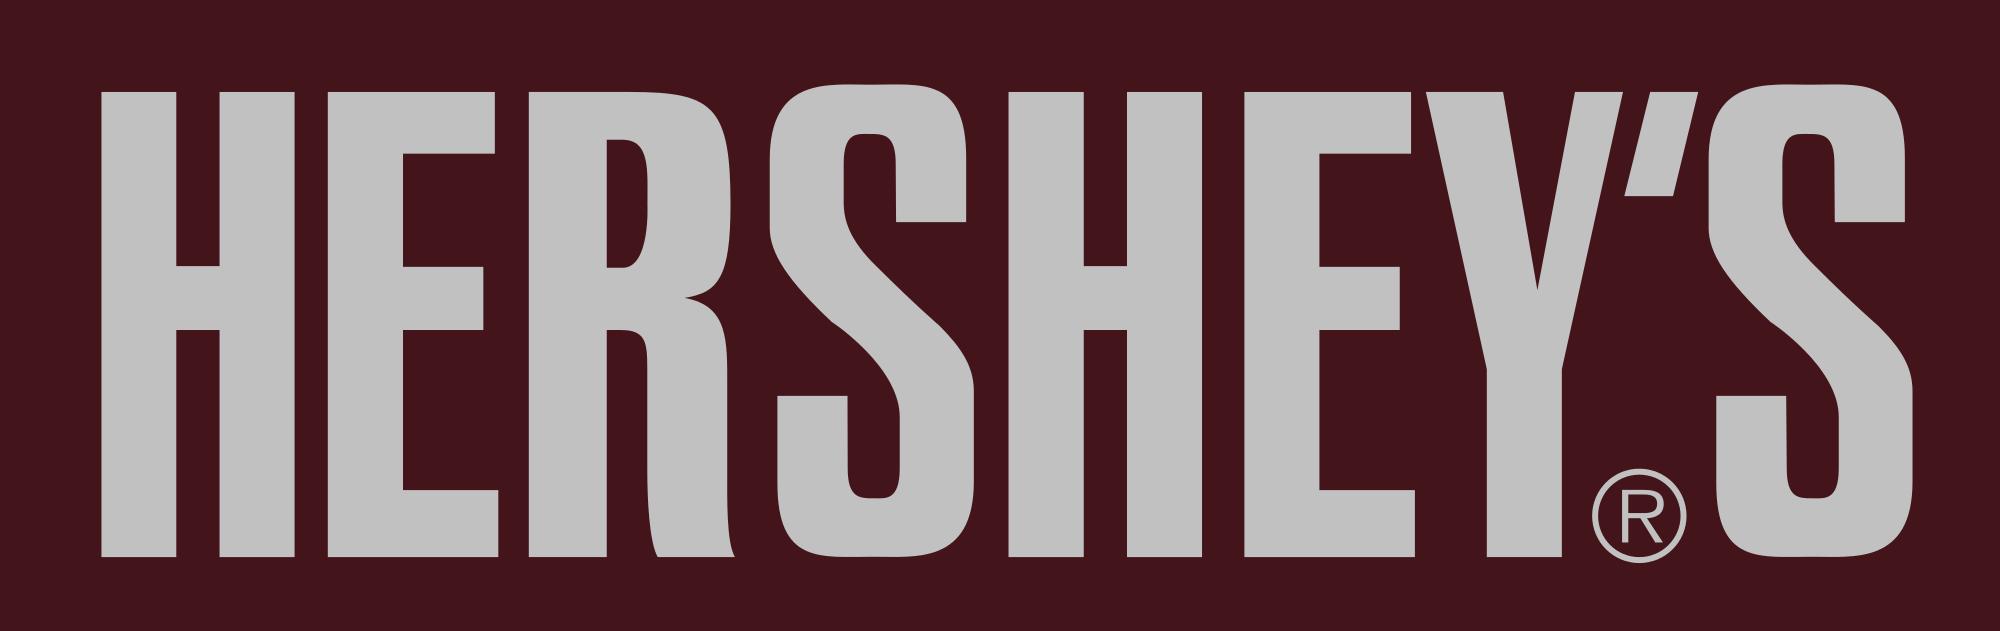 2000px Hershey Logo Svg Png 2000 631 Hershey Logo Hersheys Chocolate Logo